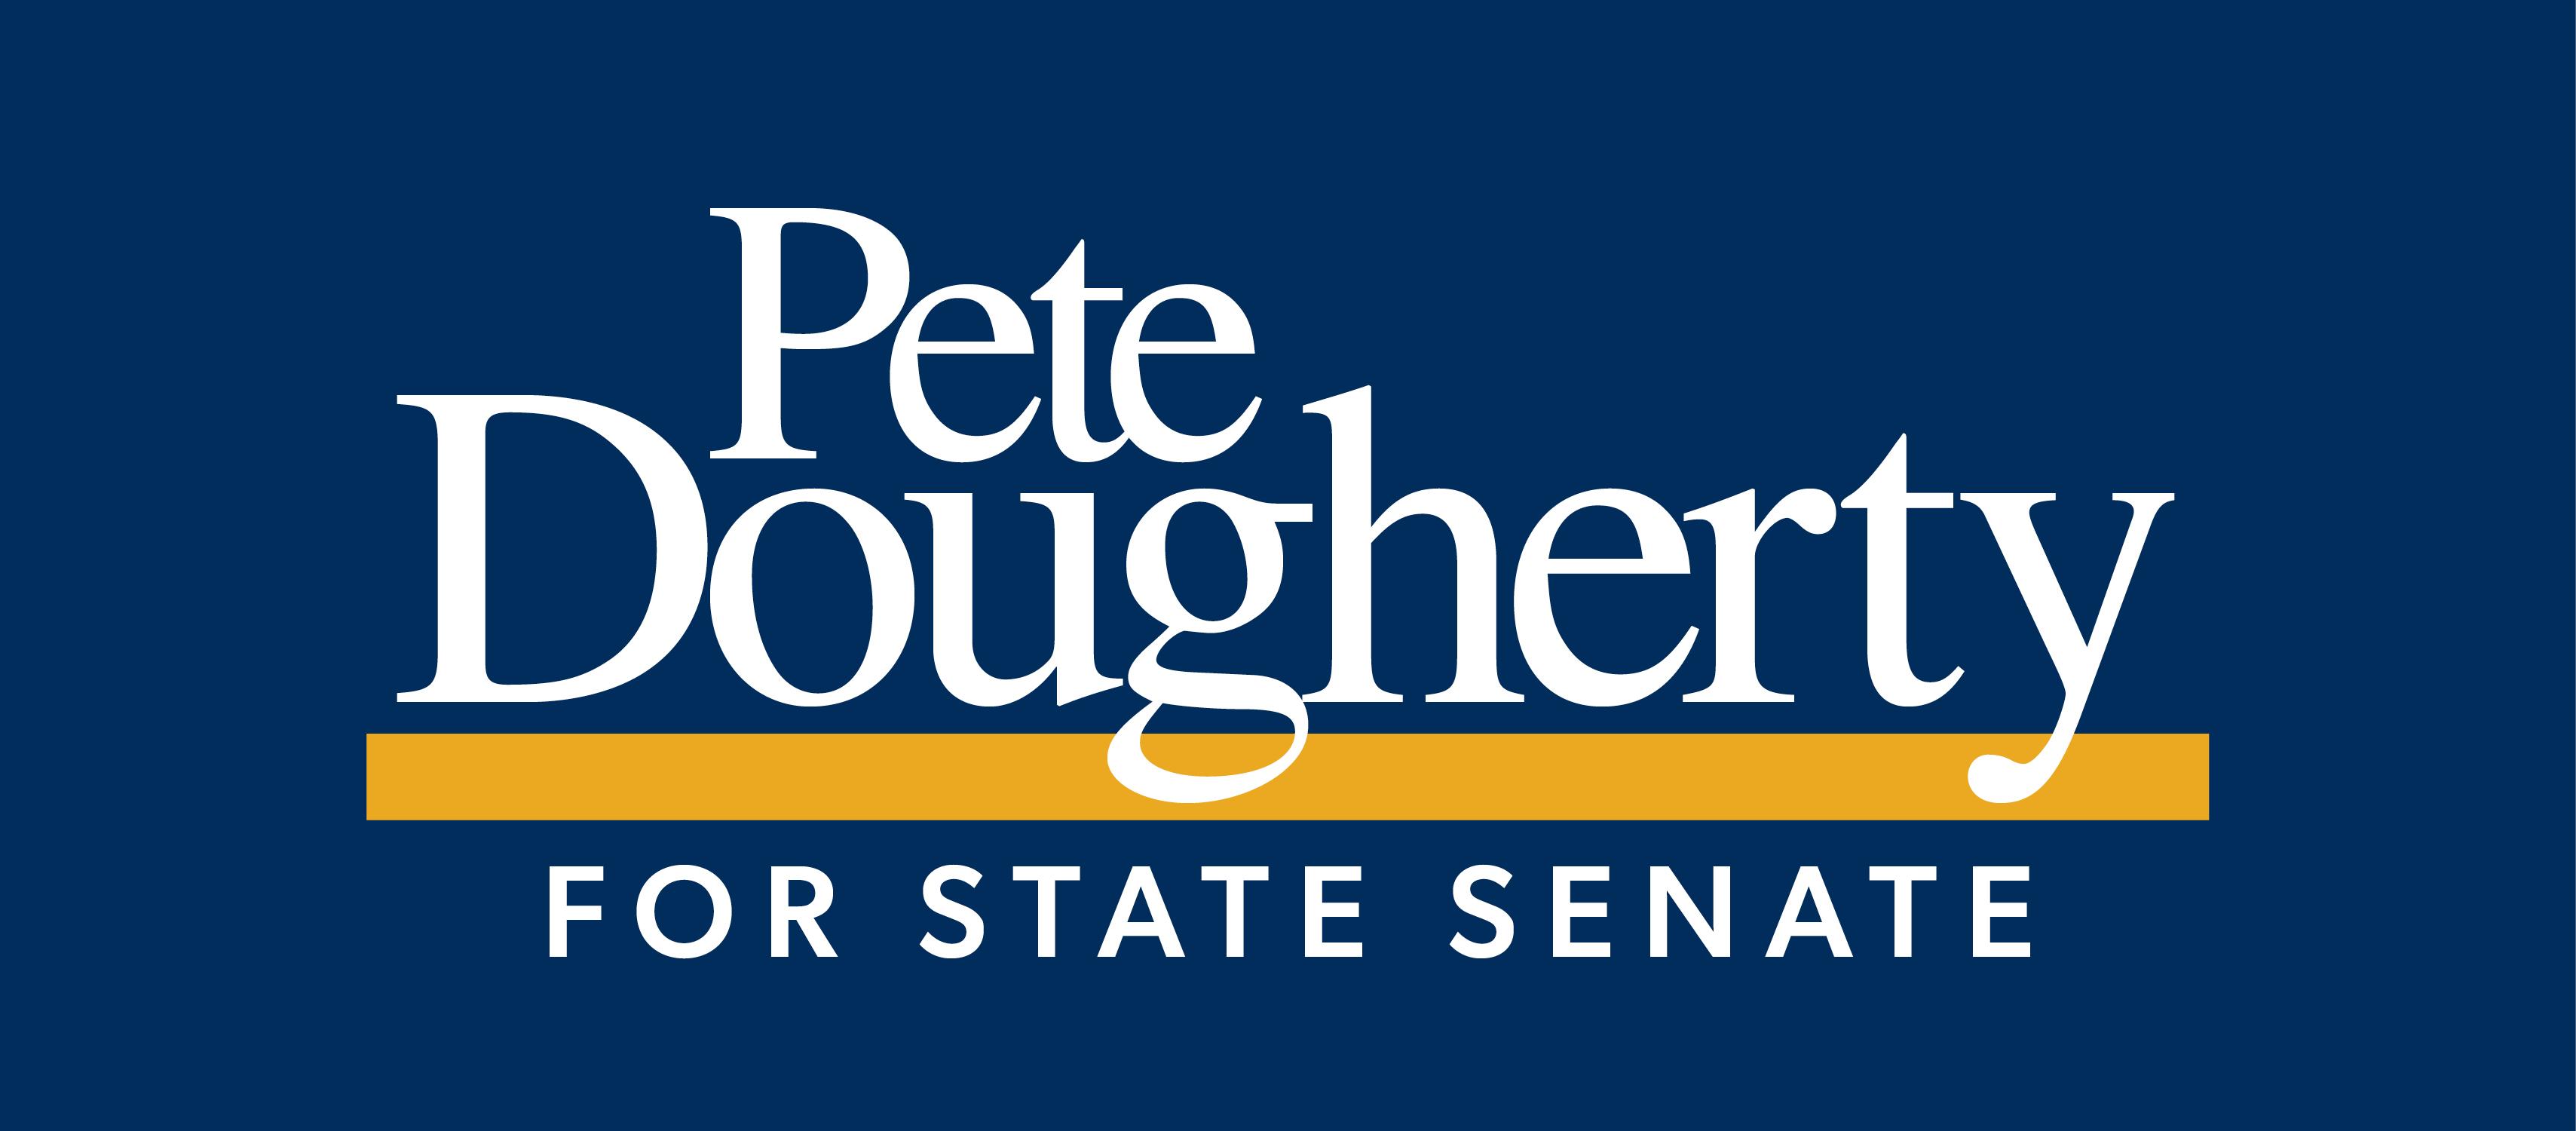 Pete Dougherty